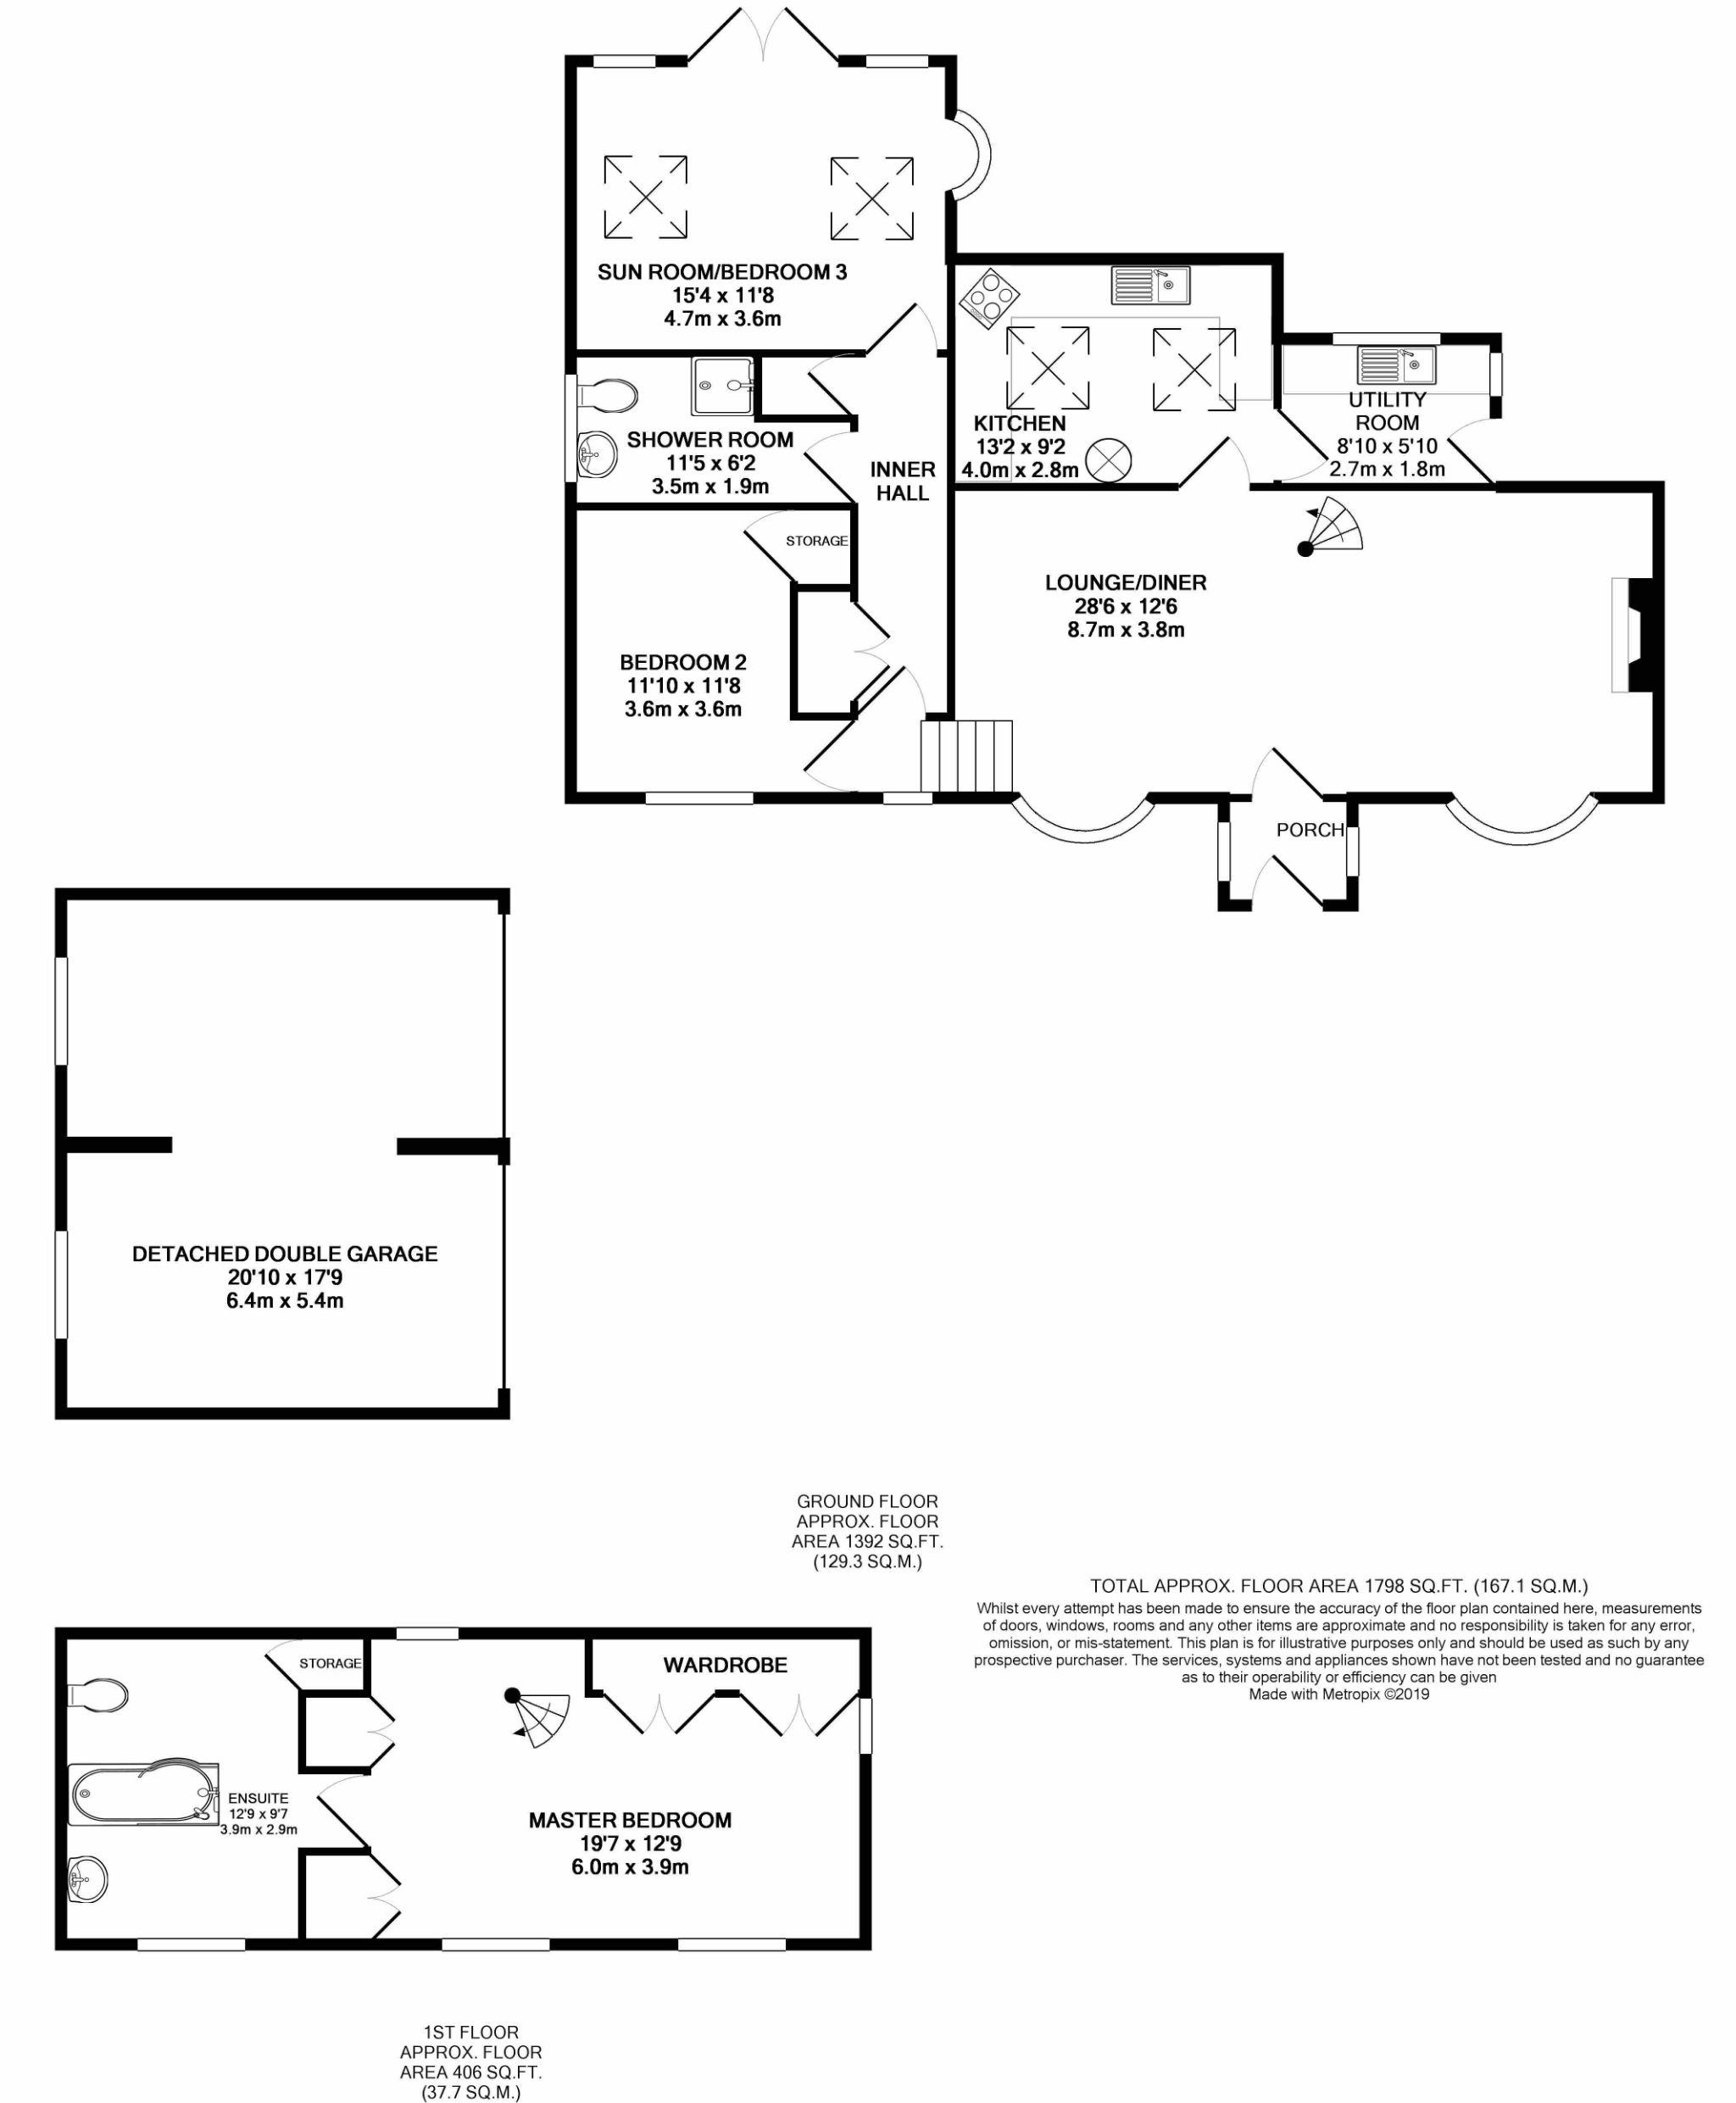 3 bedroom cottage house For Sale in West Baldwin - Floorplan 1